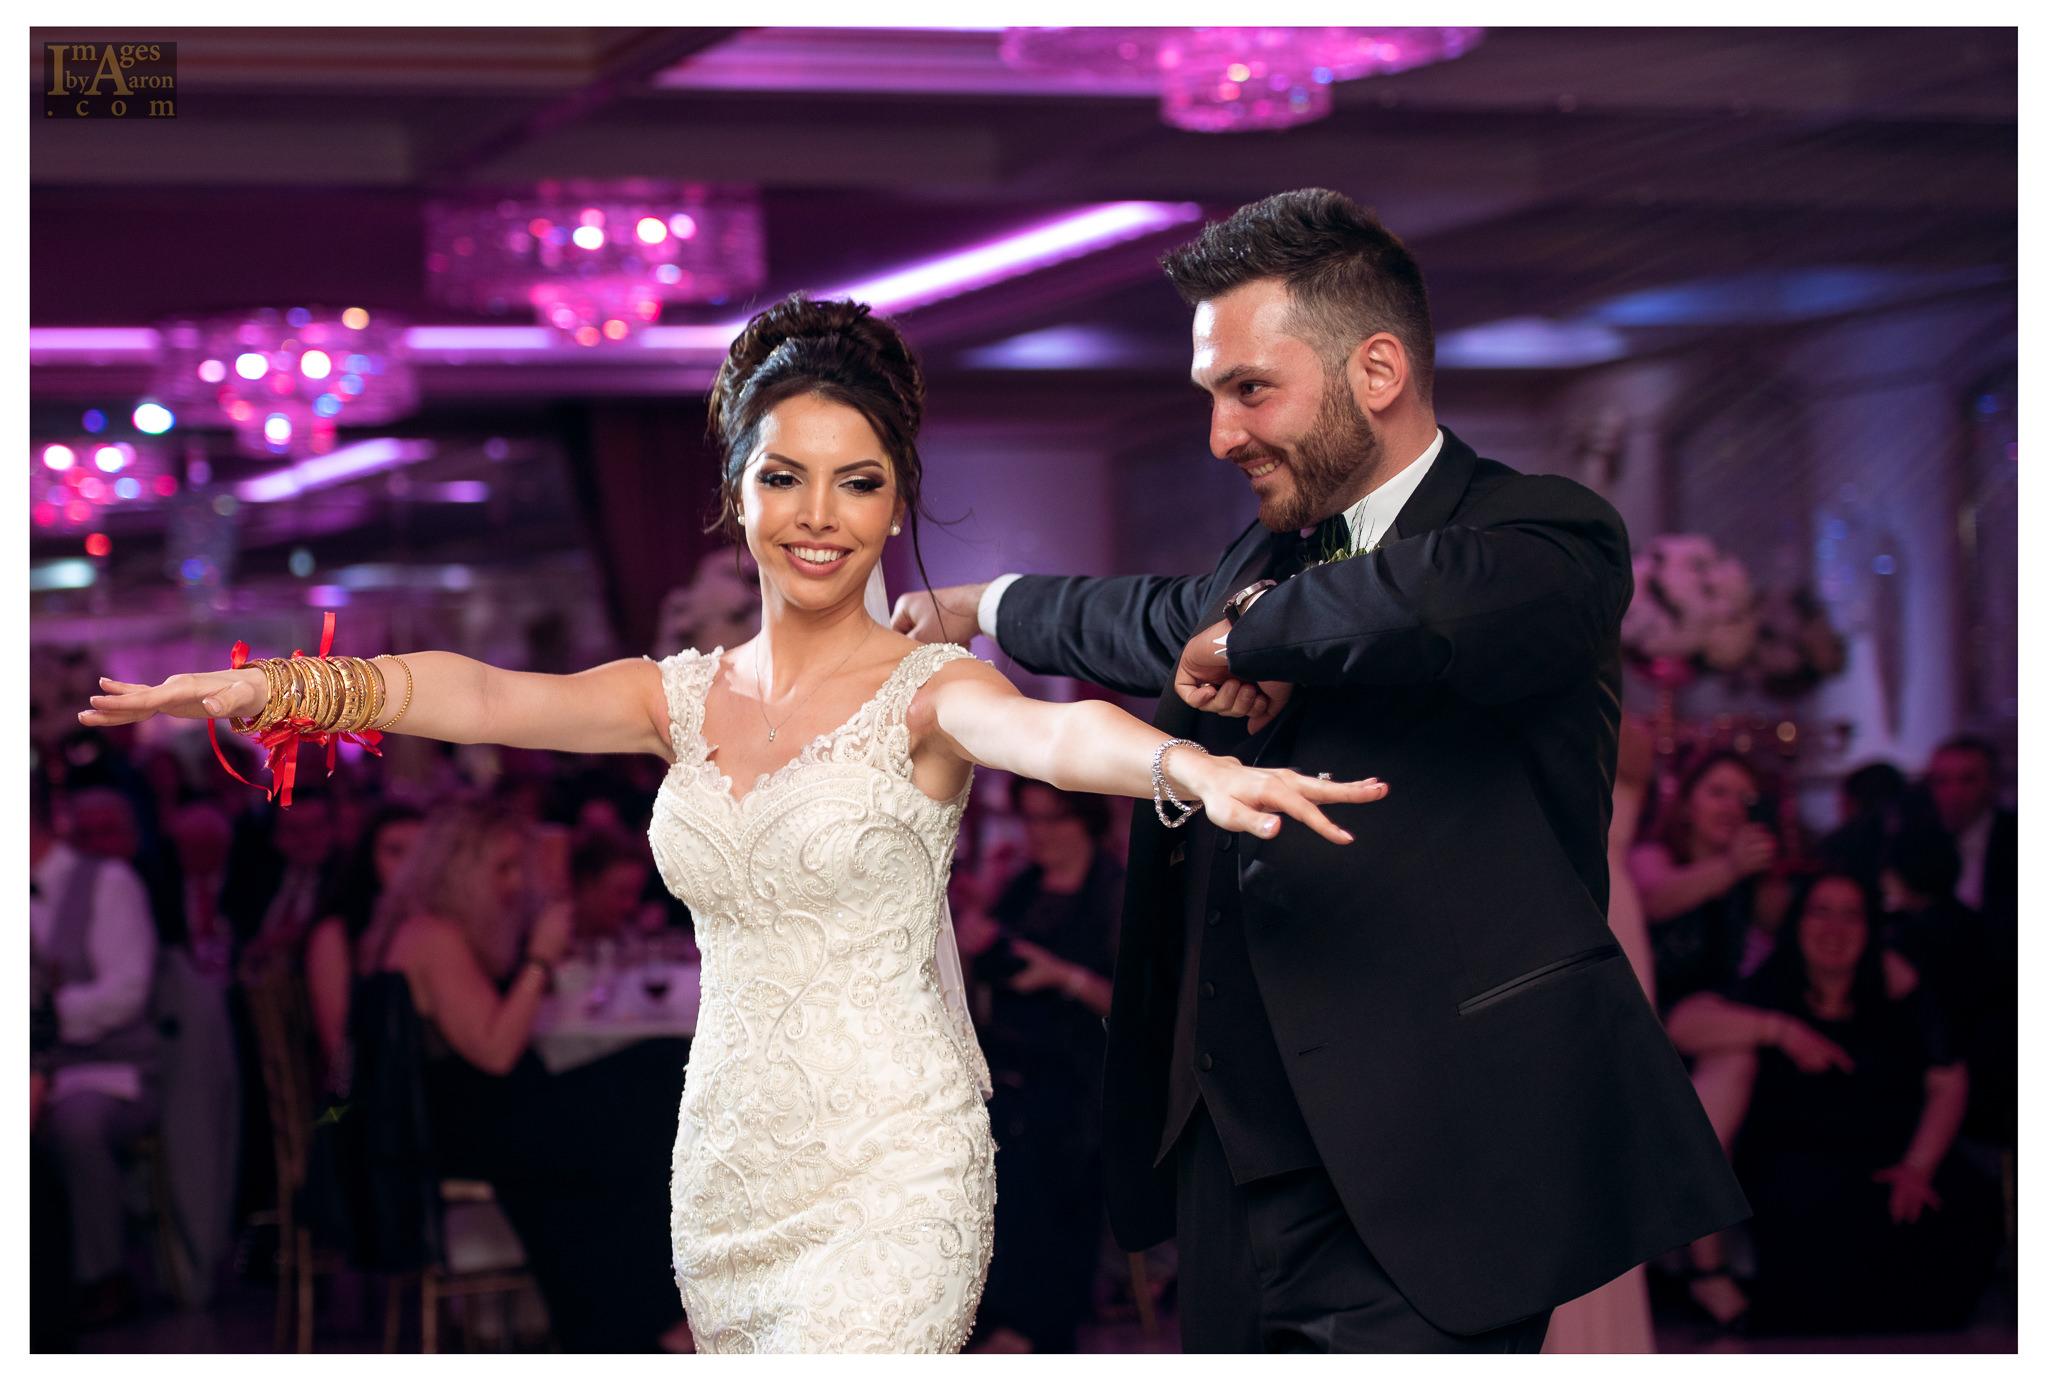 Gokce Turkish Wedding Reception New York Photographer Wedding Photography The Royal Manor-34.jpg